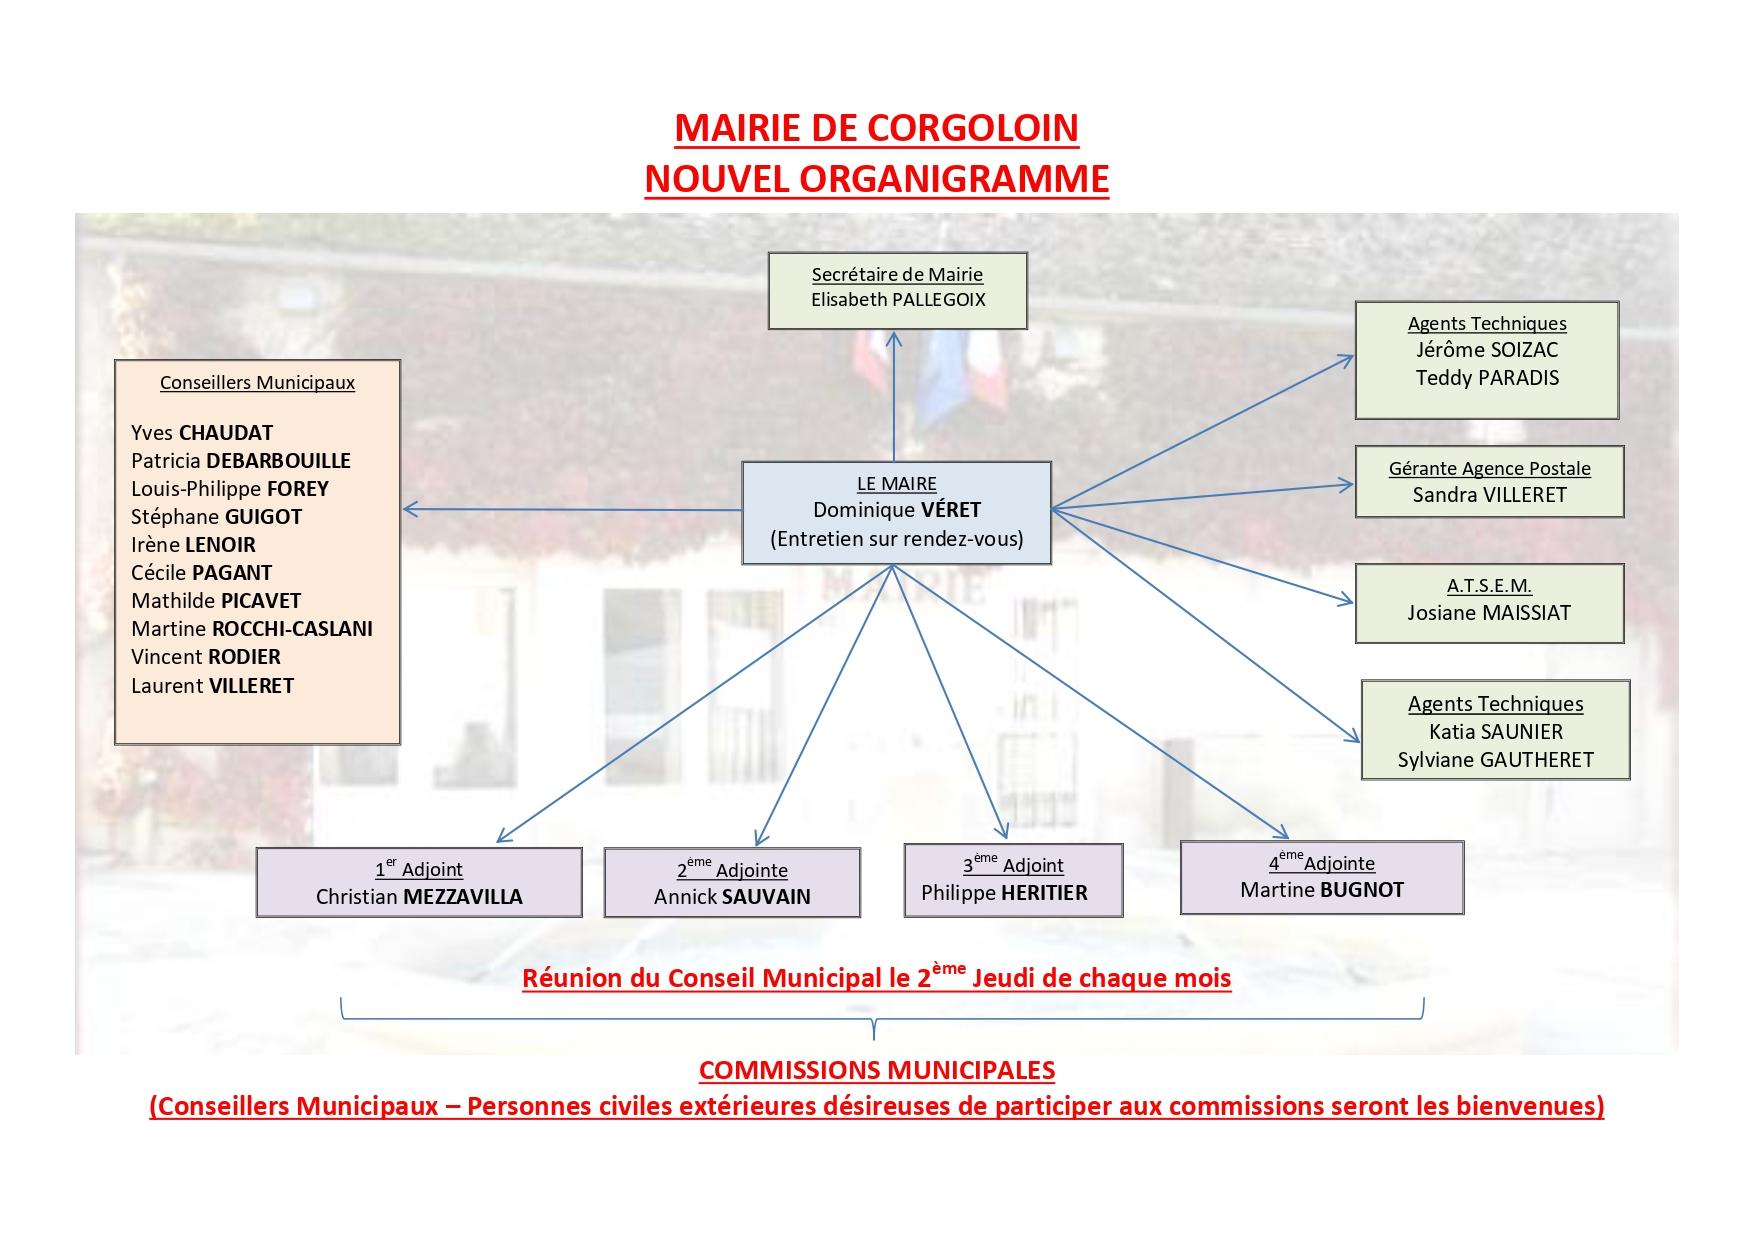 ORGANIGRAMME MAIRIE DE CORGOLOIN_page-0001